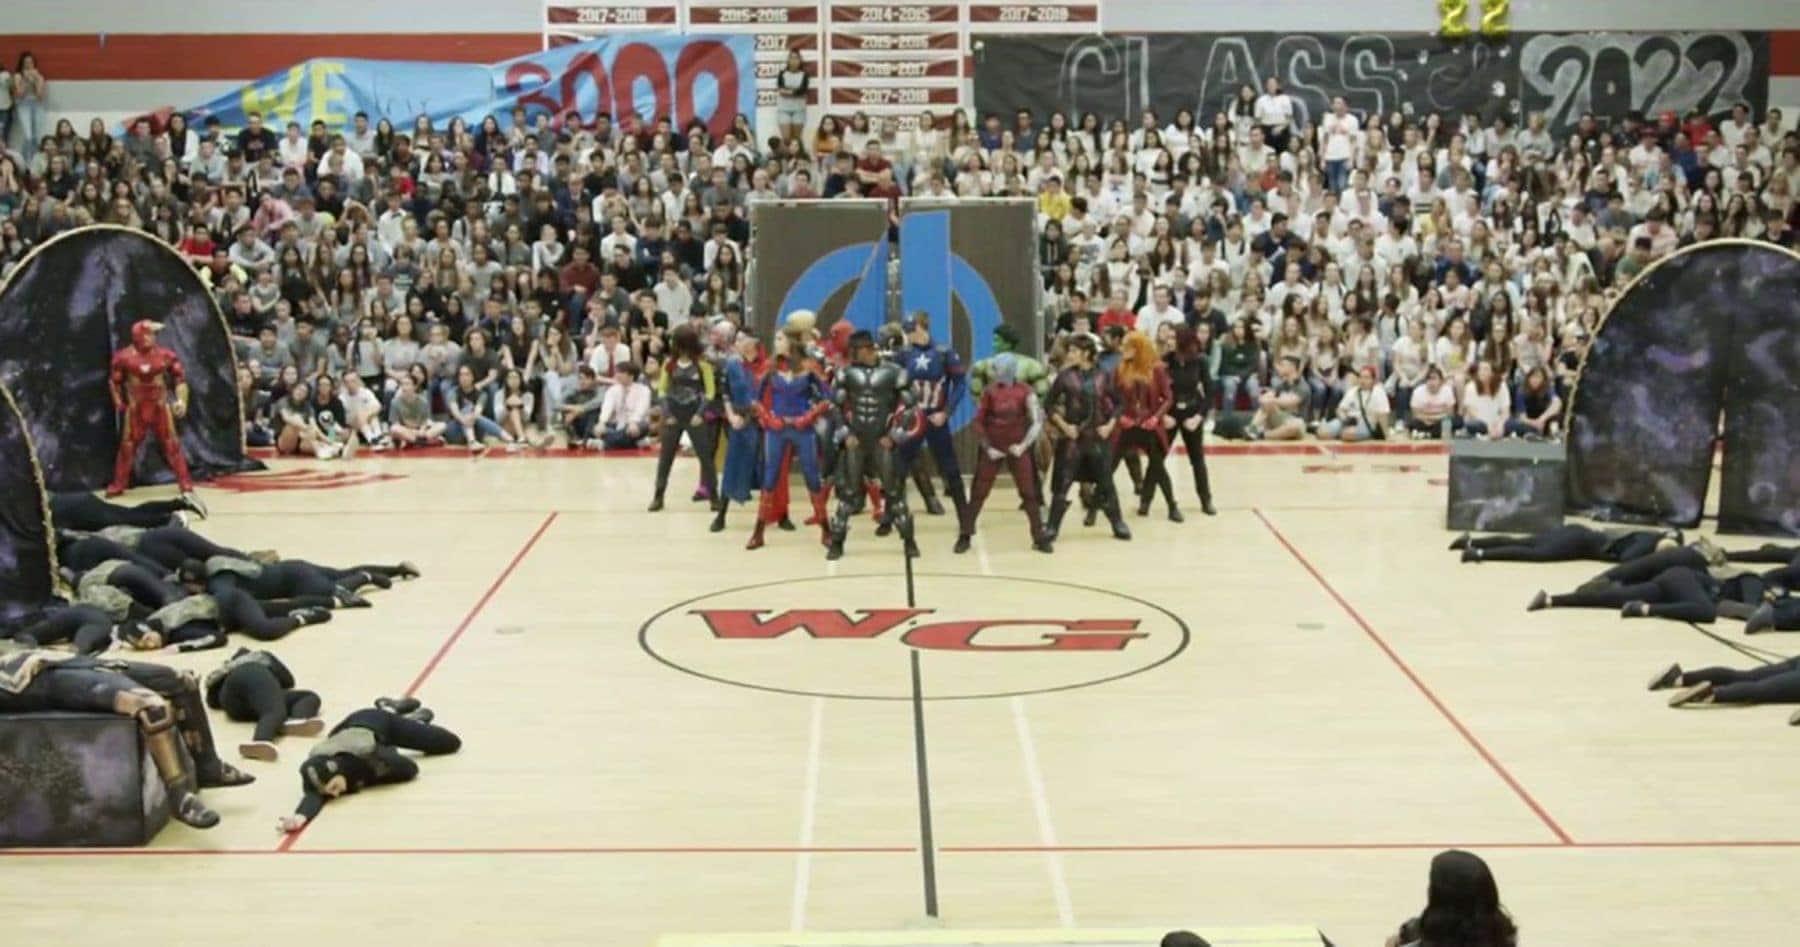 Eine Avengers-Tanzperformance | Awesome | Was is hier eigentlich los?